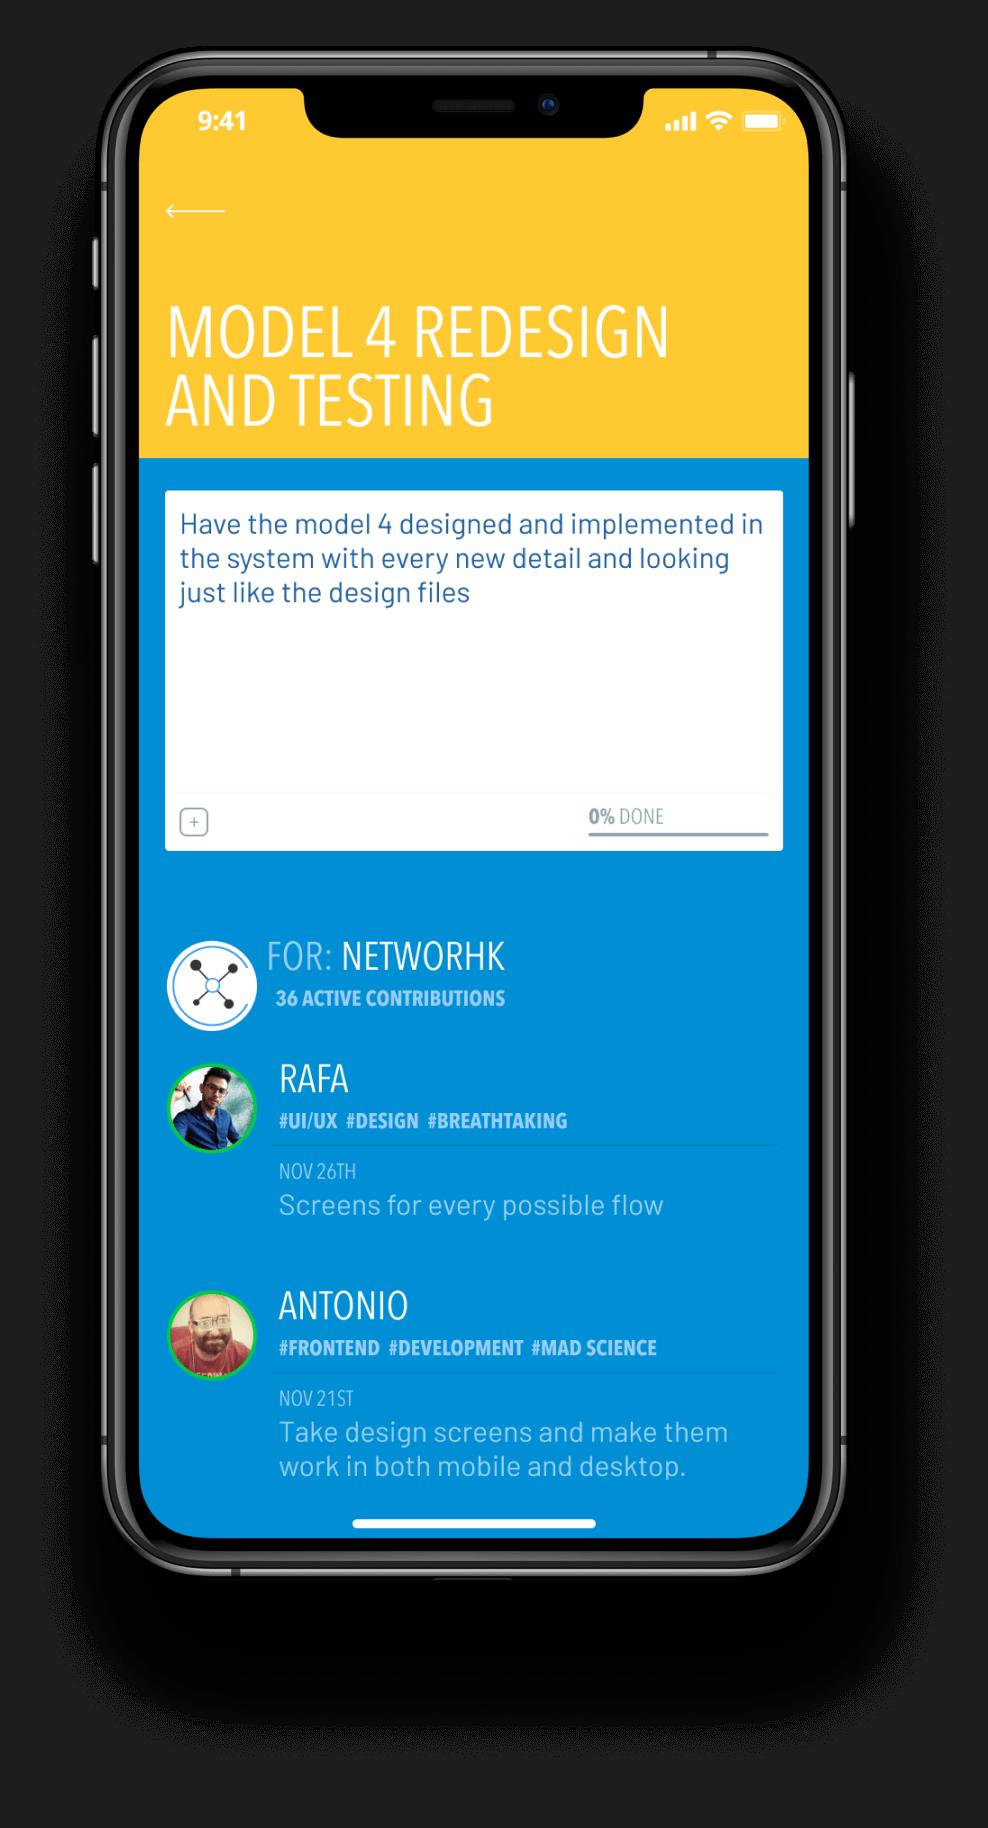 netwoRHk app on an iPhoneX